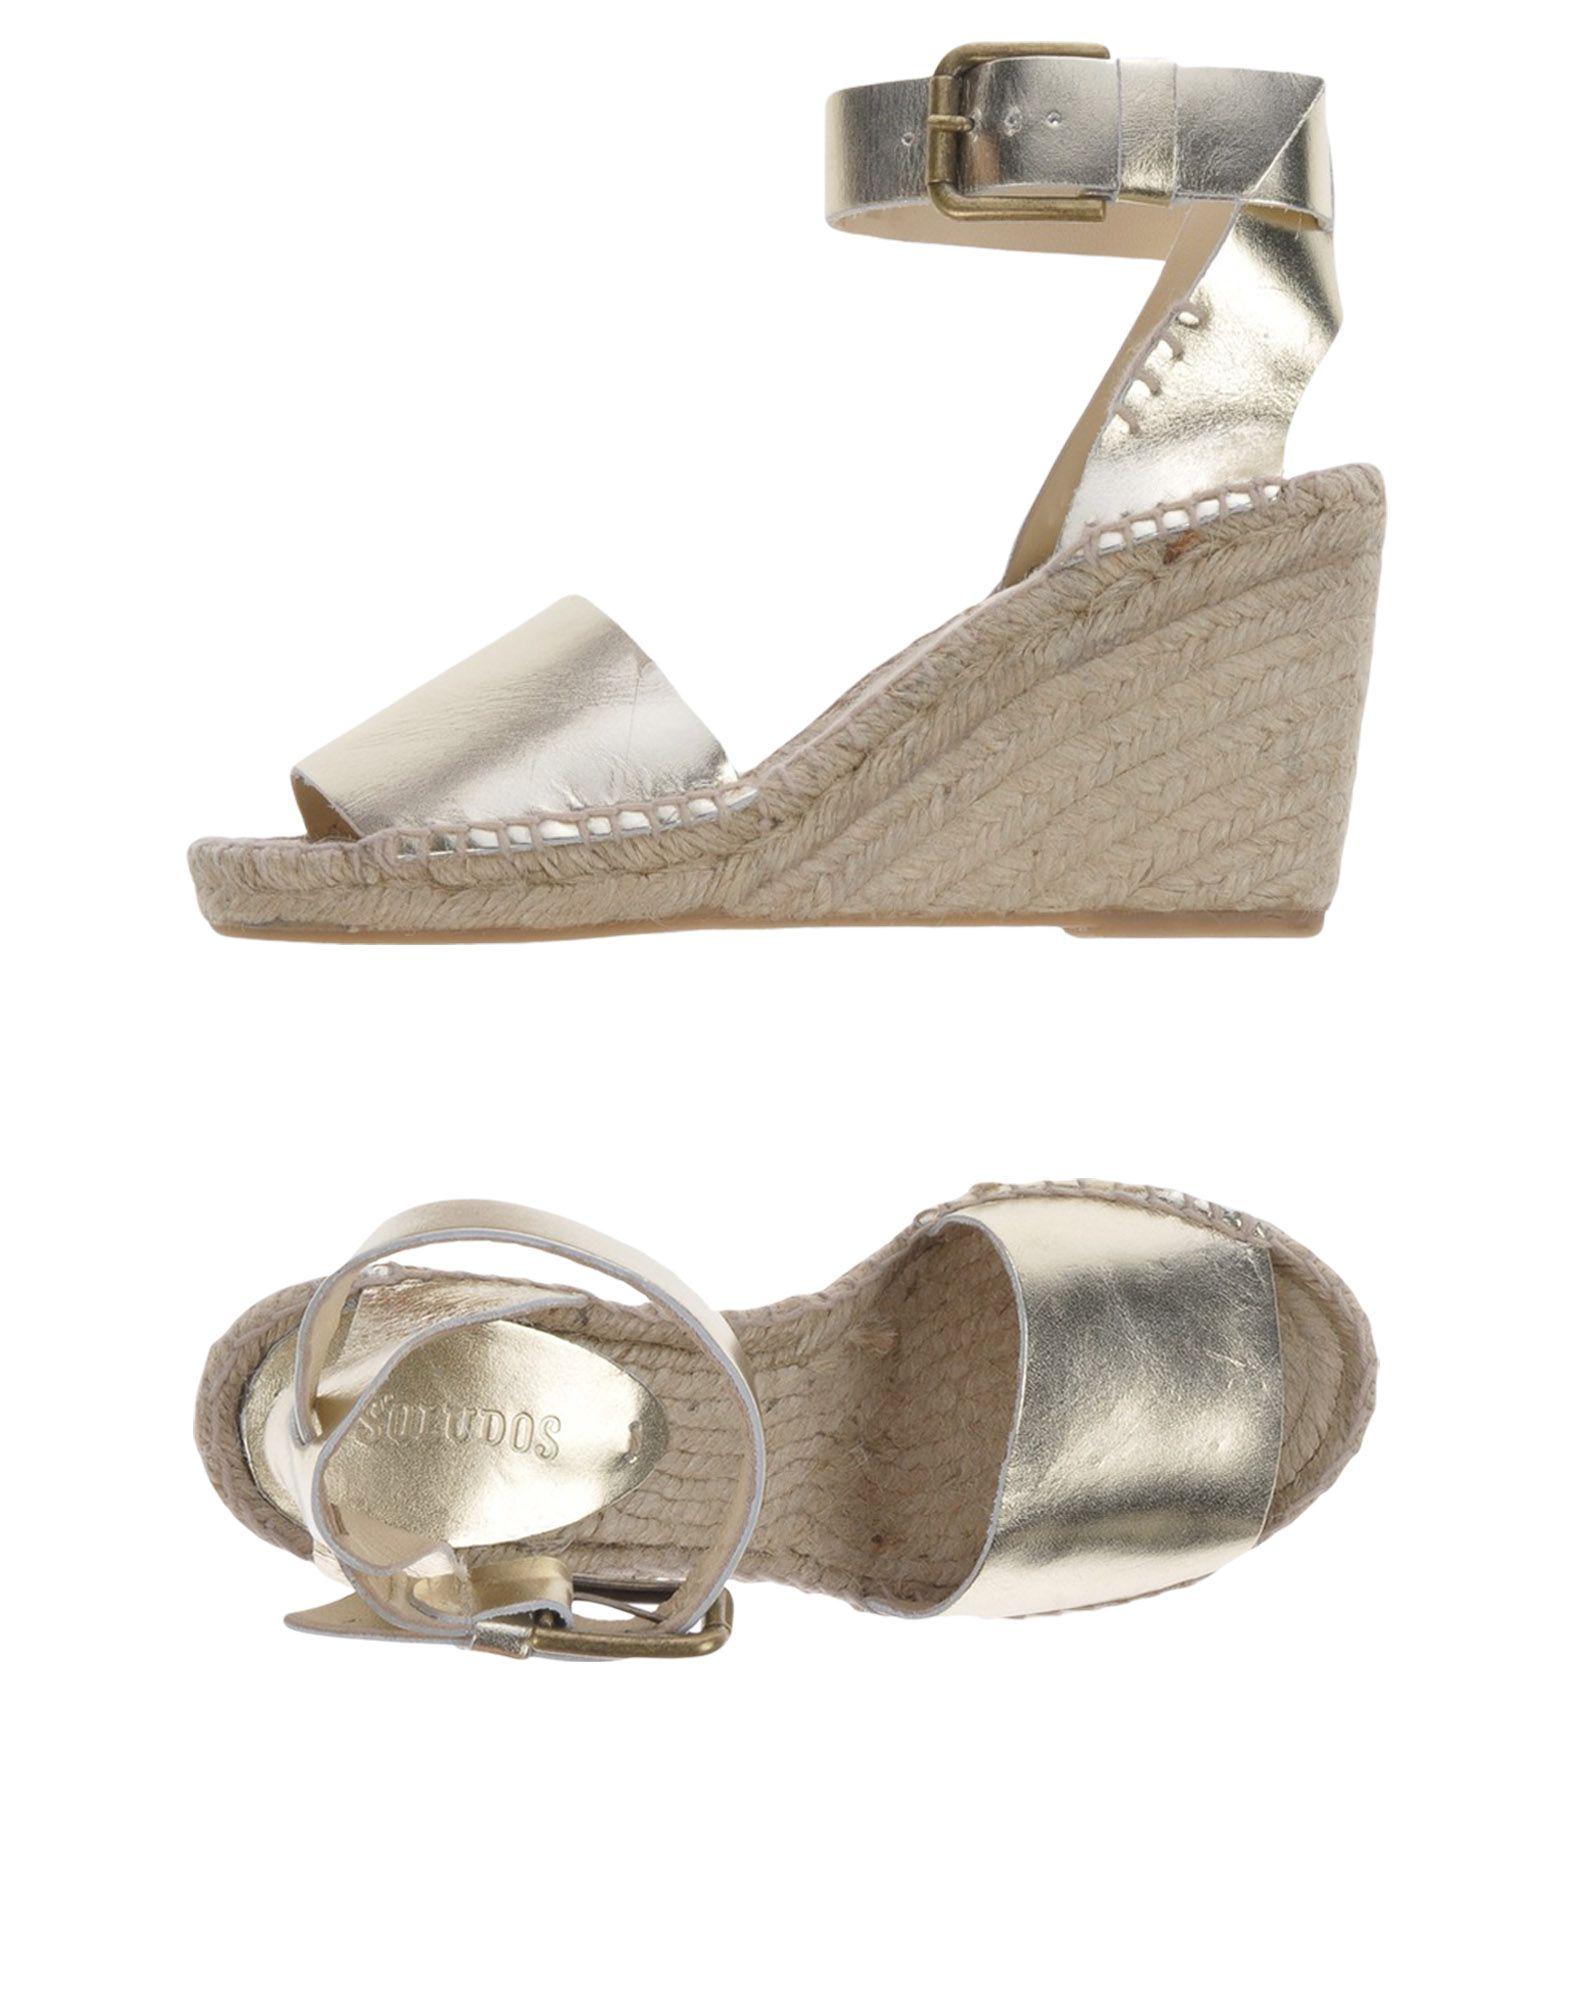 Soludos Sandalen Damen Damen Damen  11461711JW Gute Qualität beliebte Schuhe 004611